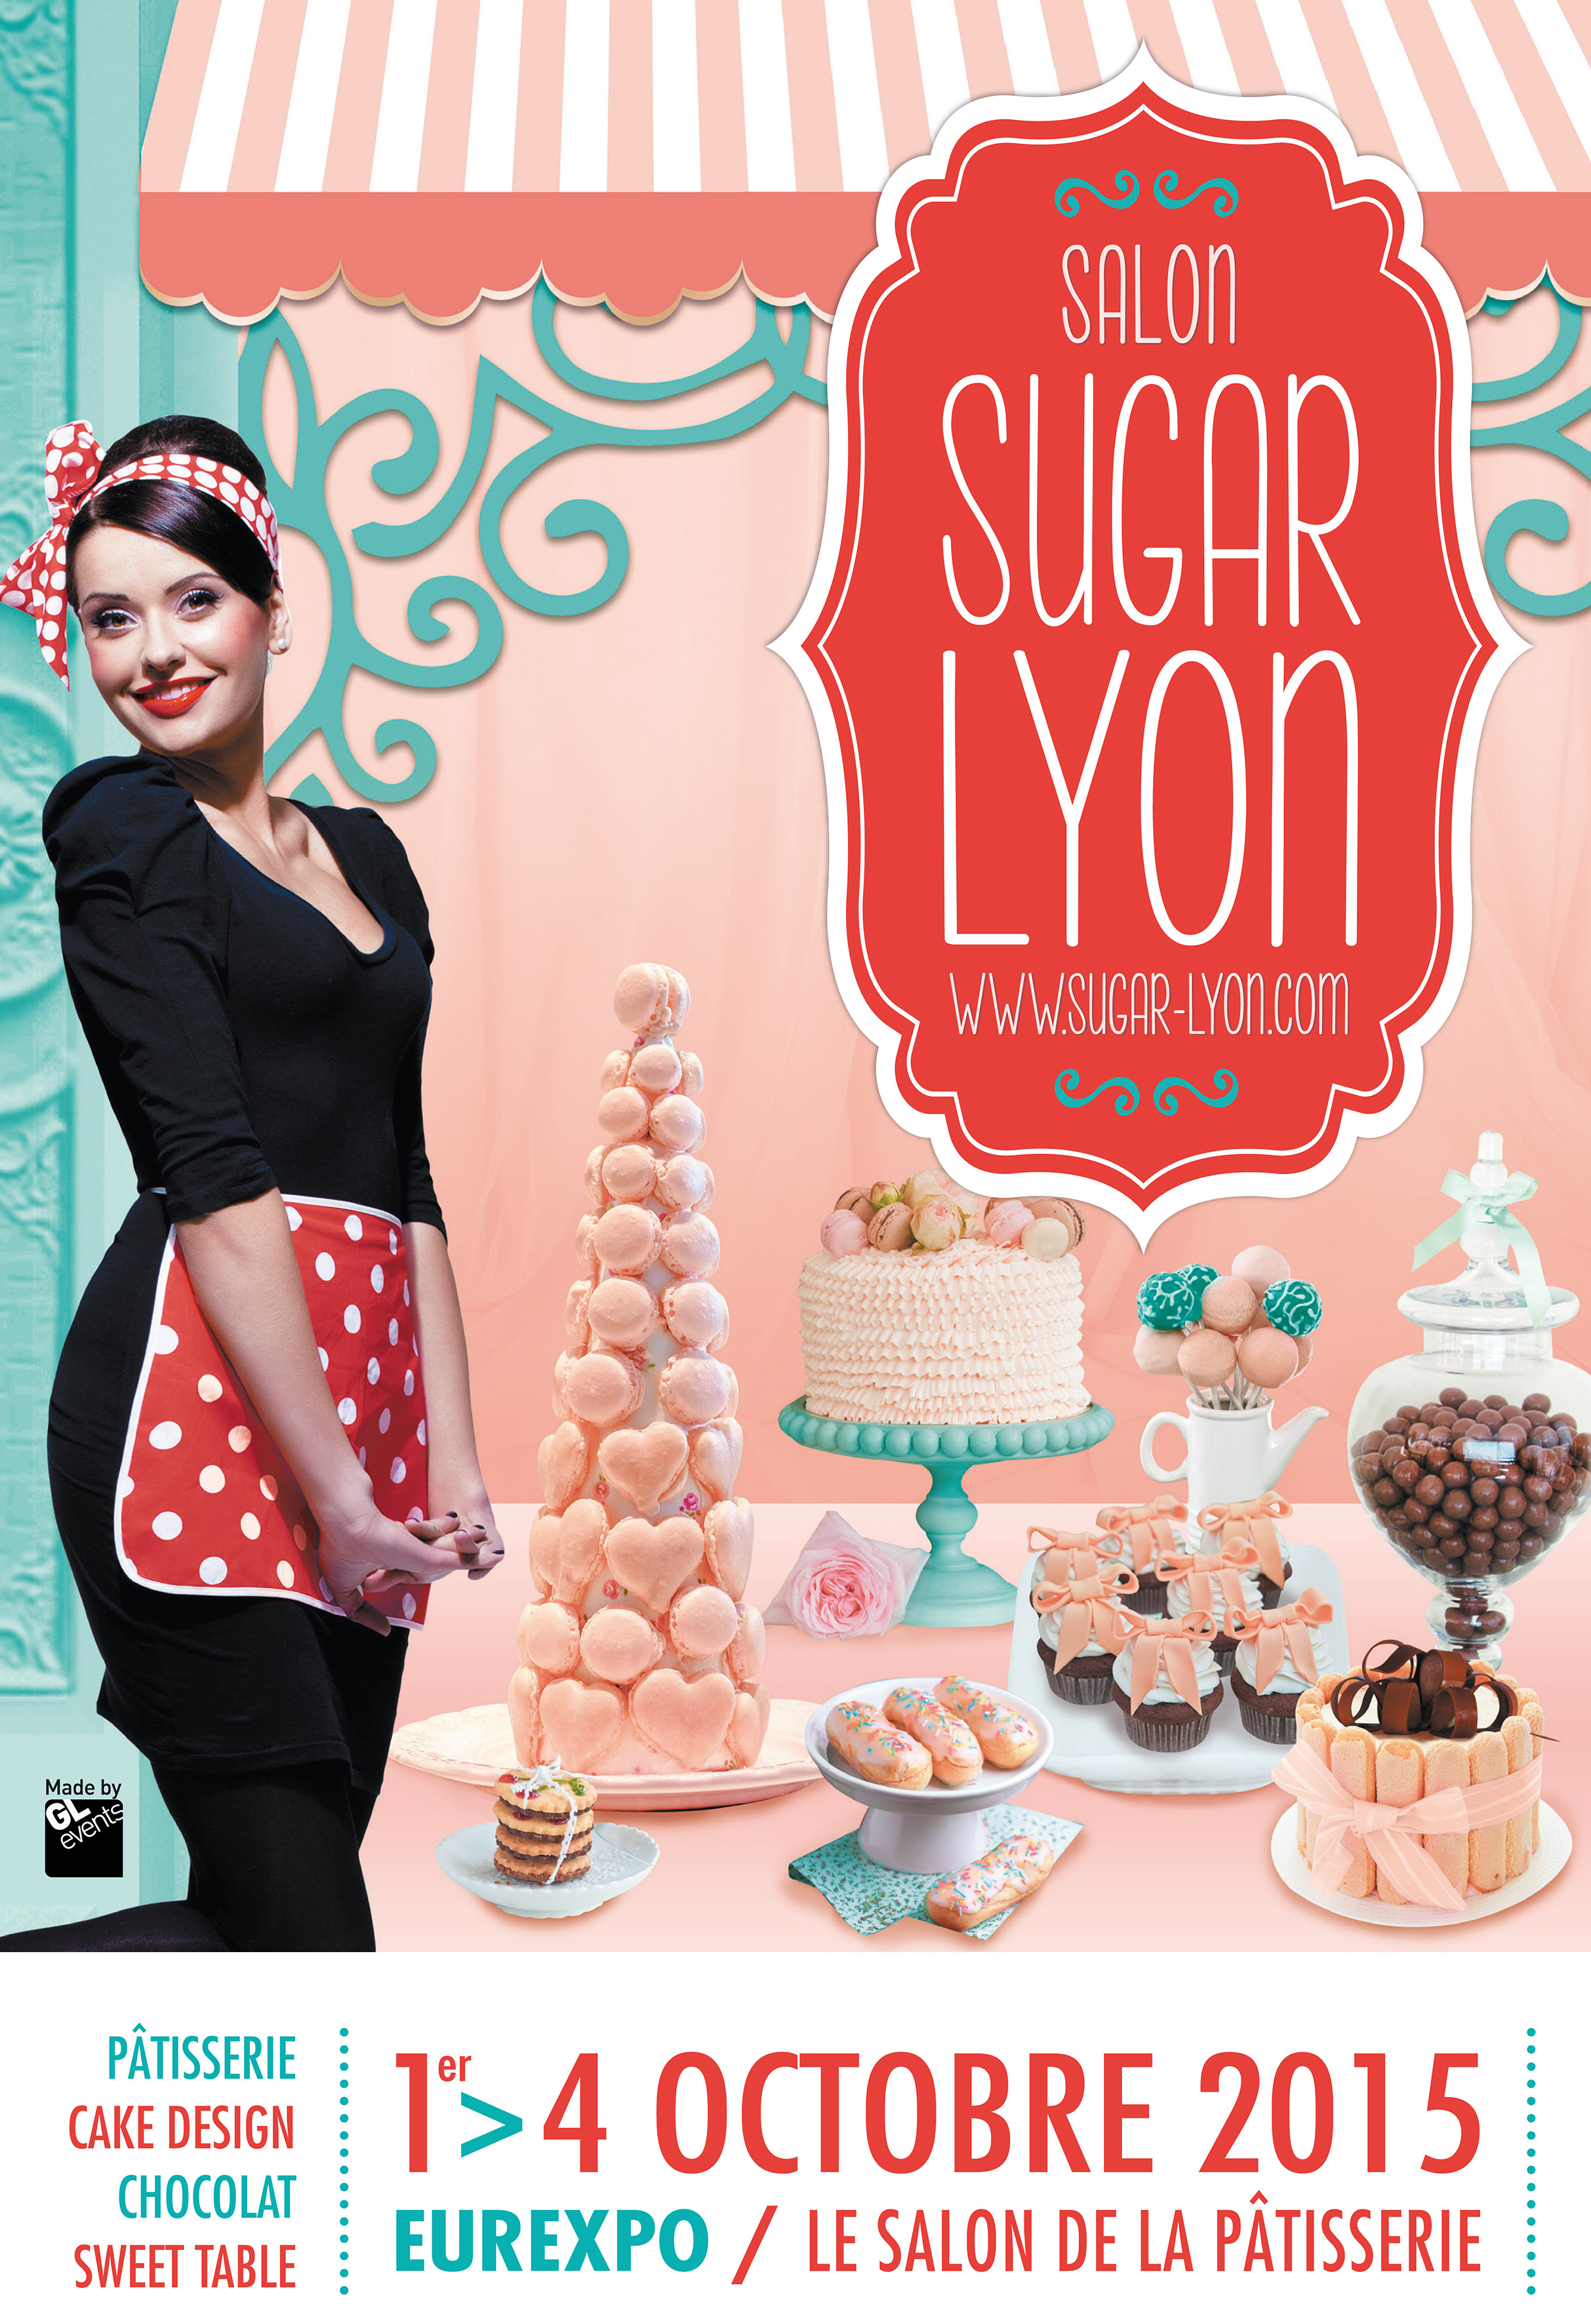 Lyon 1 re dition du le salon sugar lyon untitled magazine - Salon patisserie lyon ...